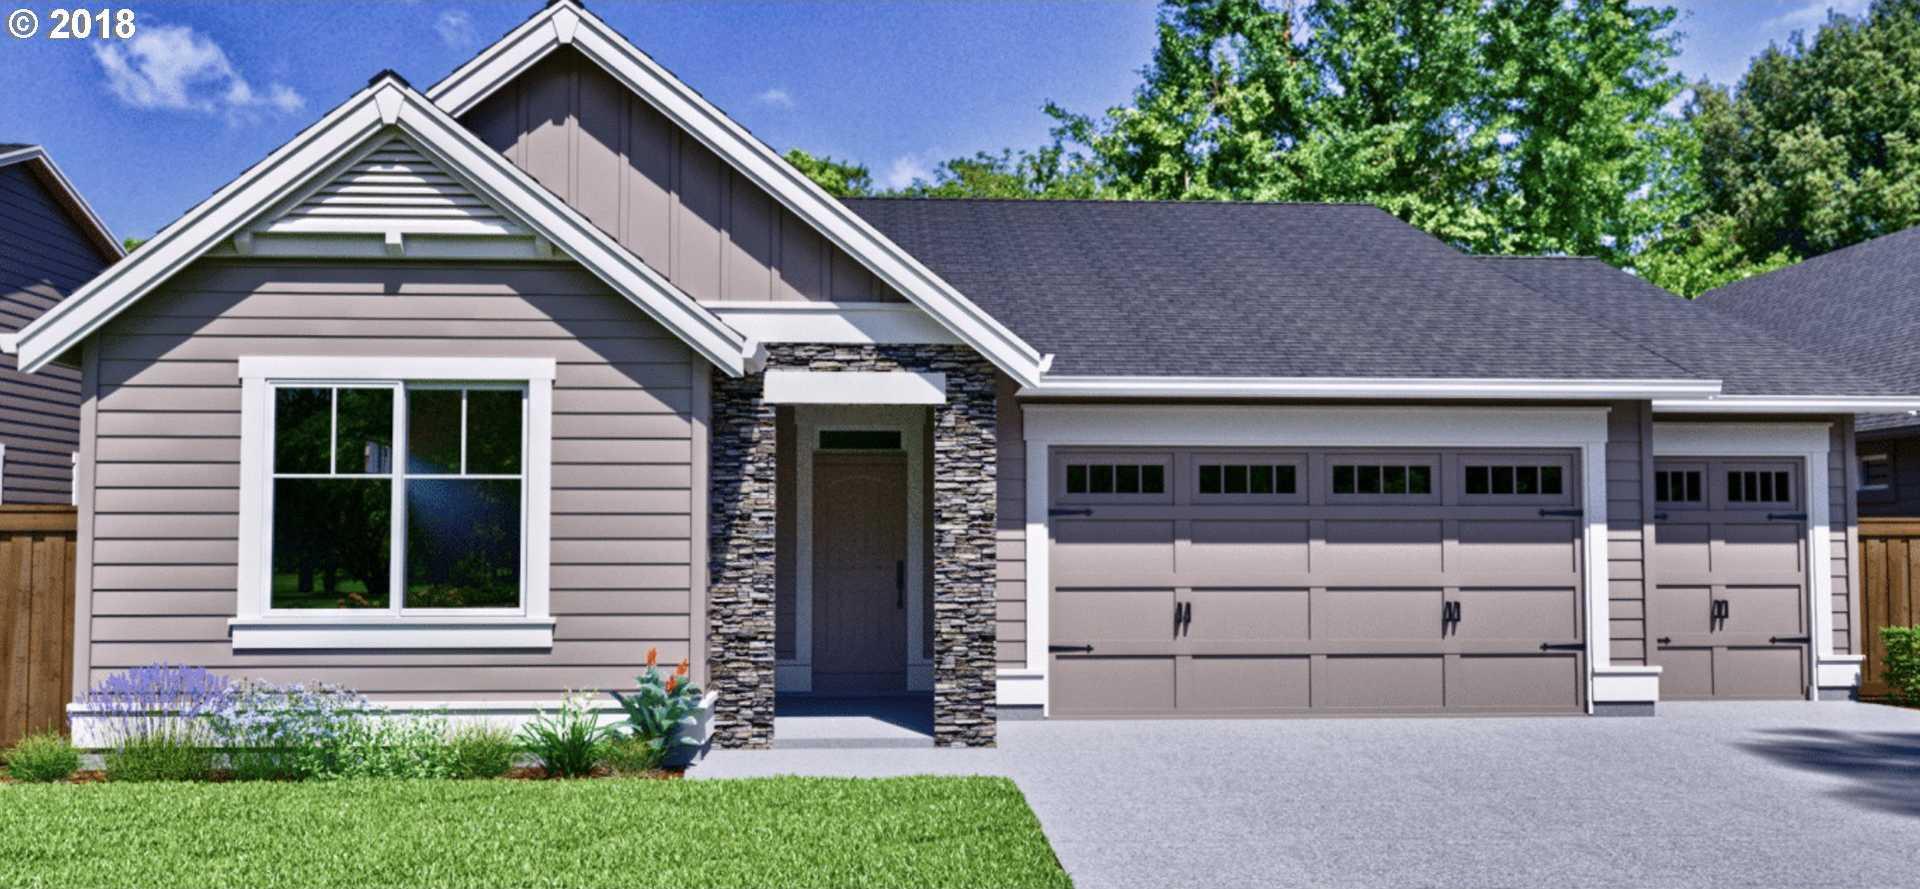 $725,000 - 3Br/3Ba -  for Sale in Charbonneau Range, Wilsonville